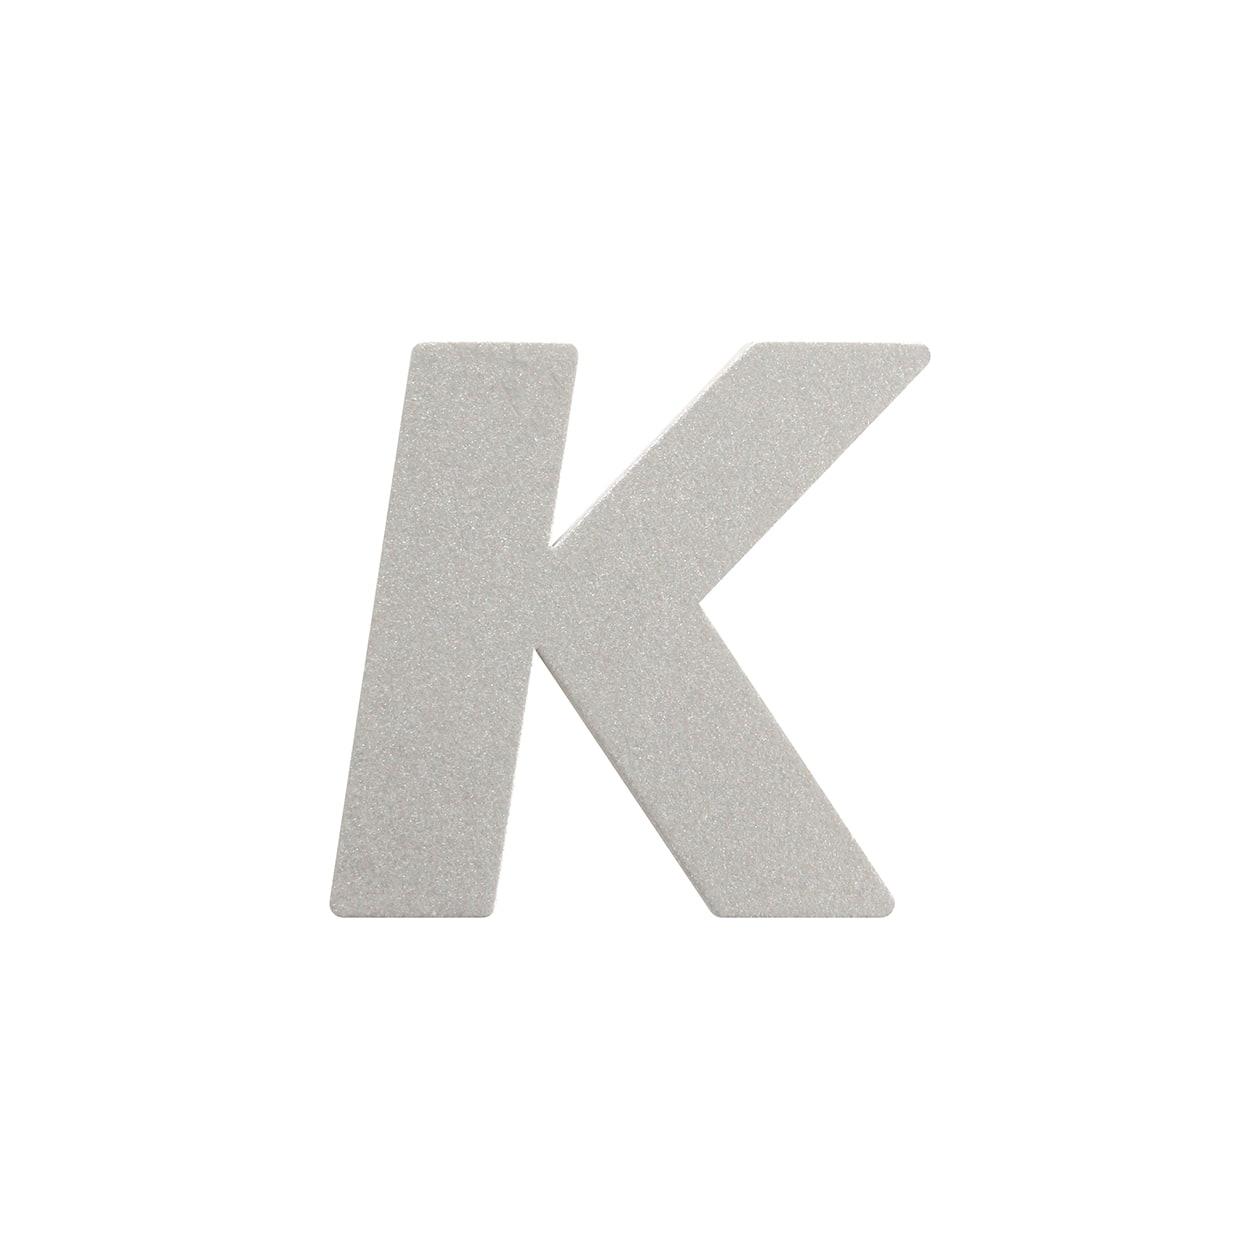 No.395ボード A7カードDC 文字K シルバー